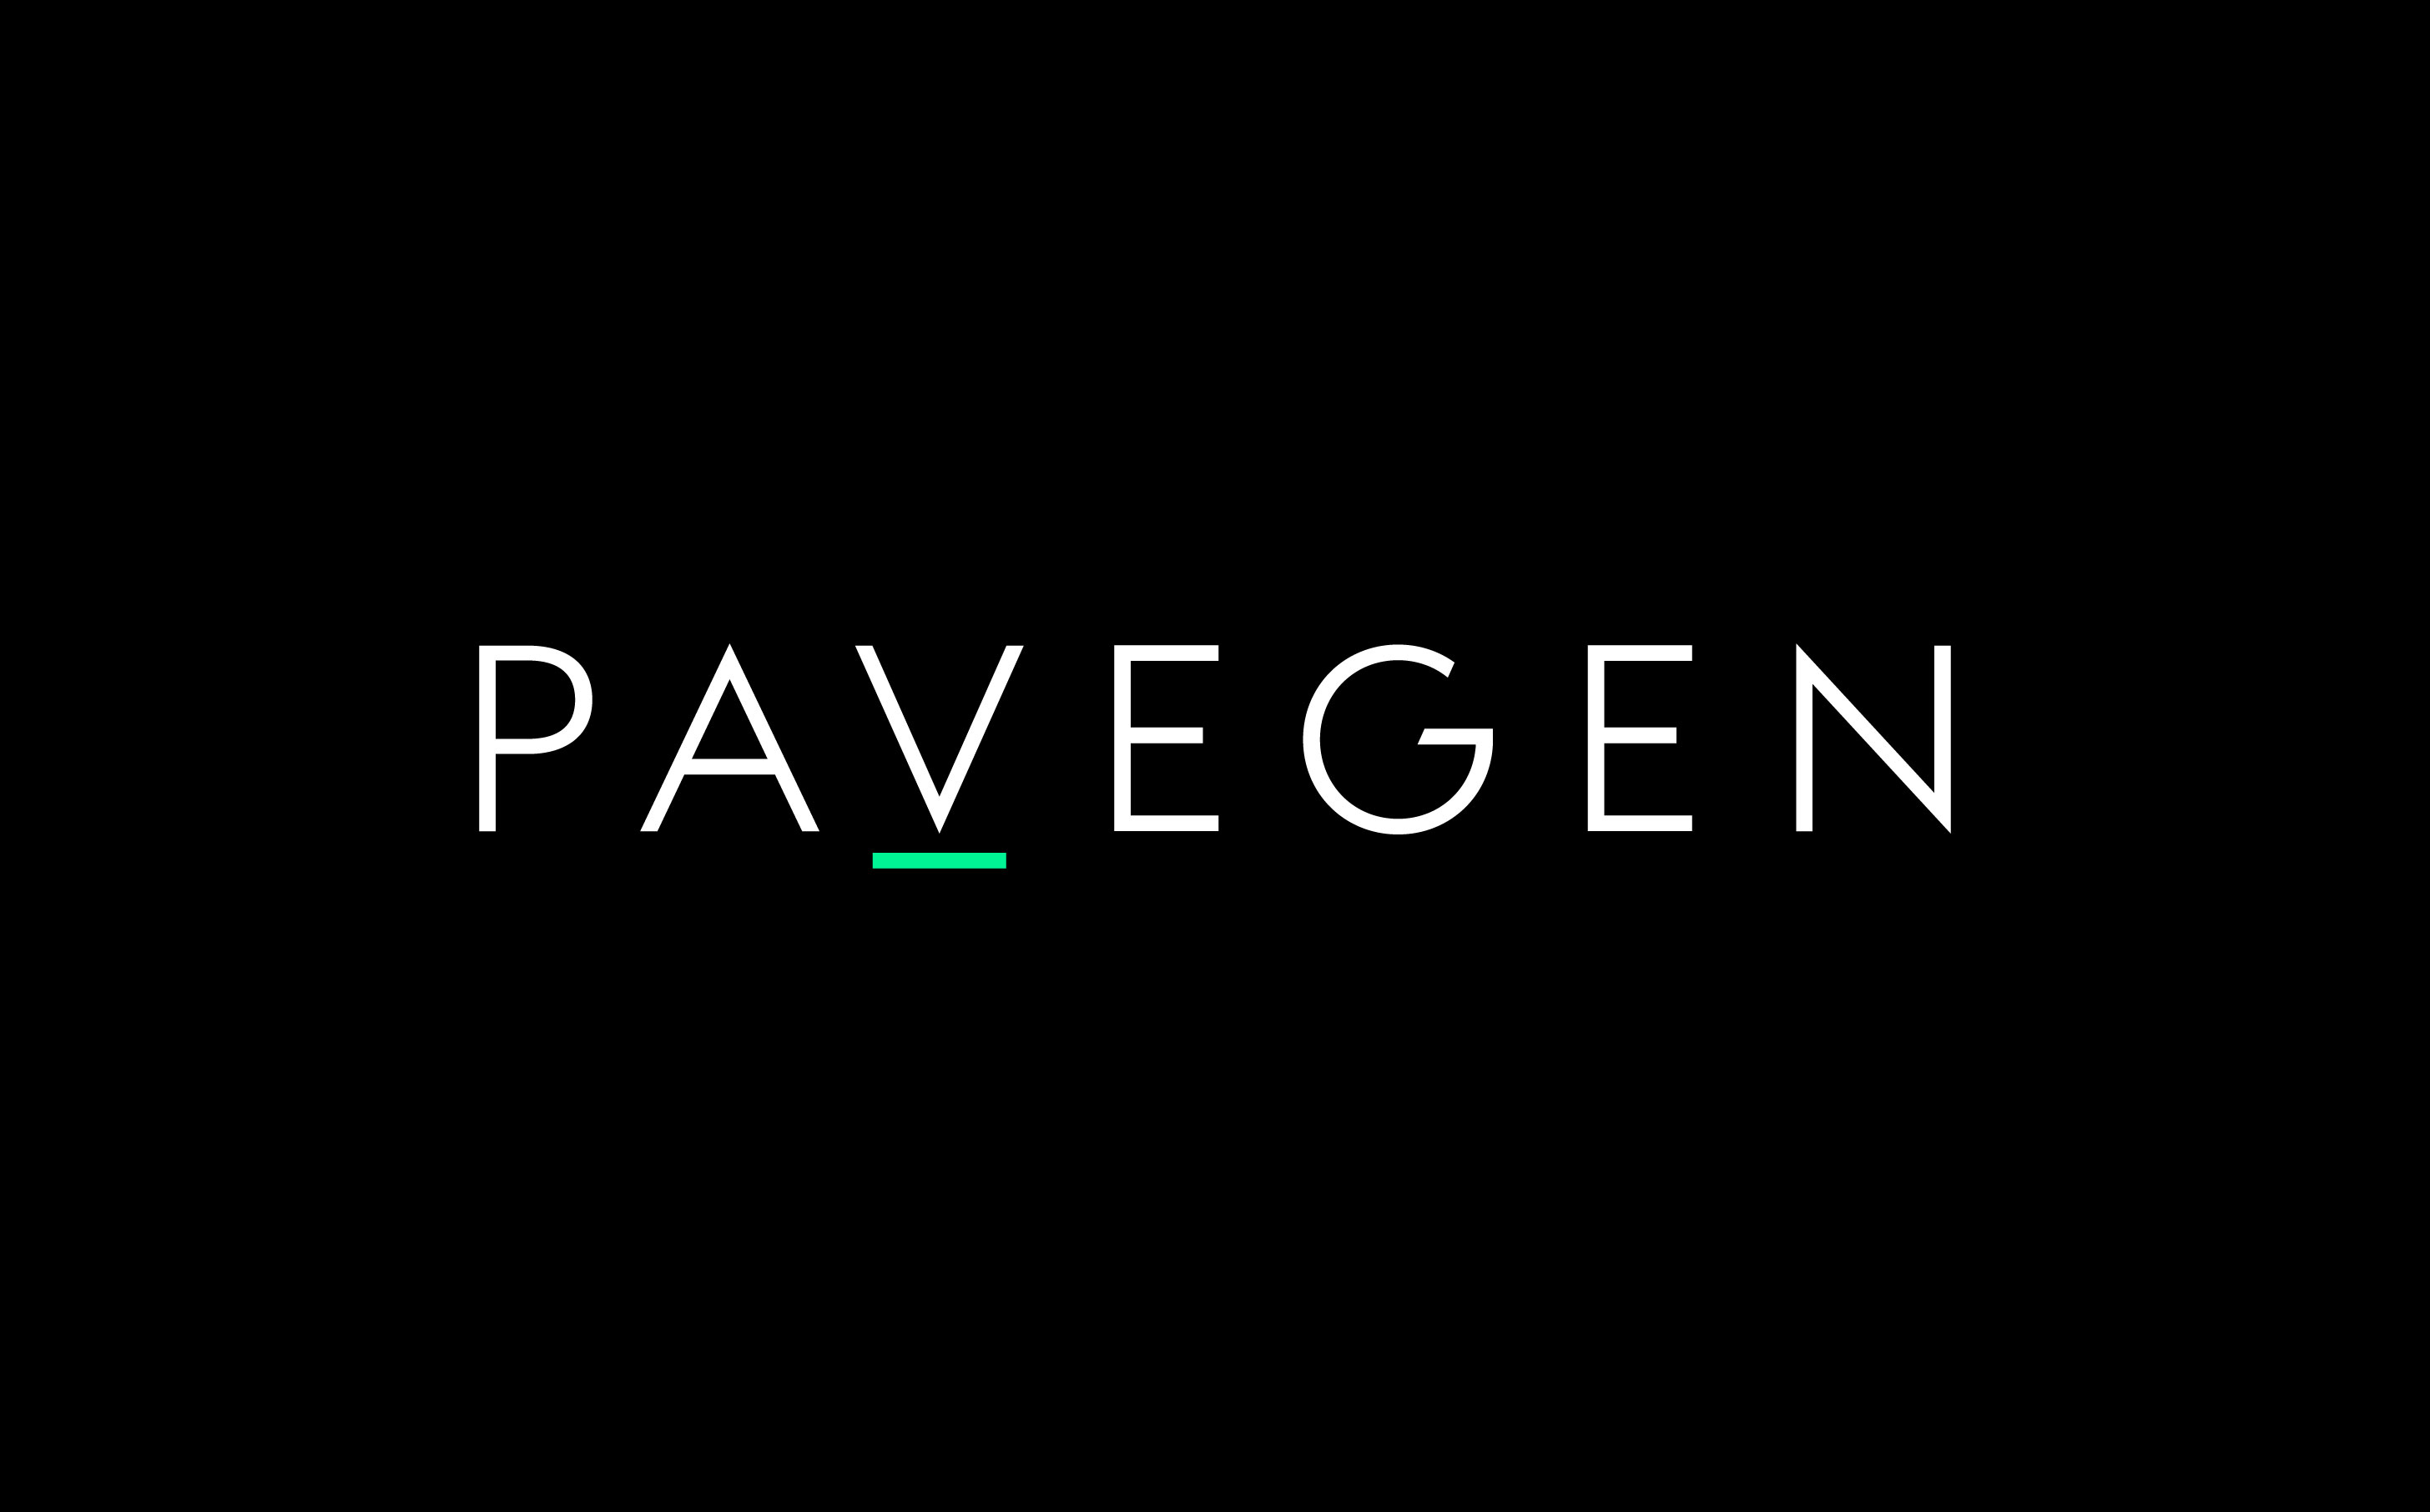 pavegen-logo